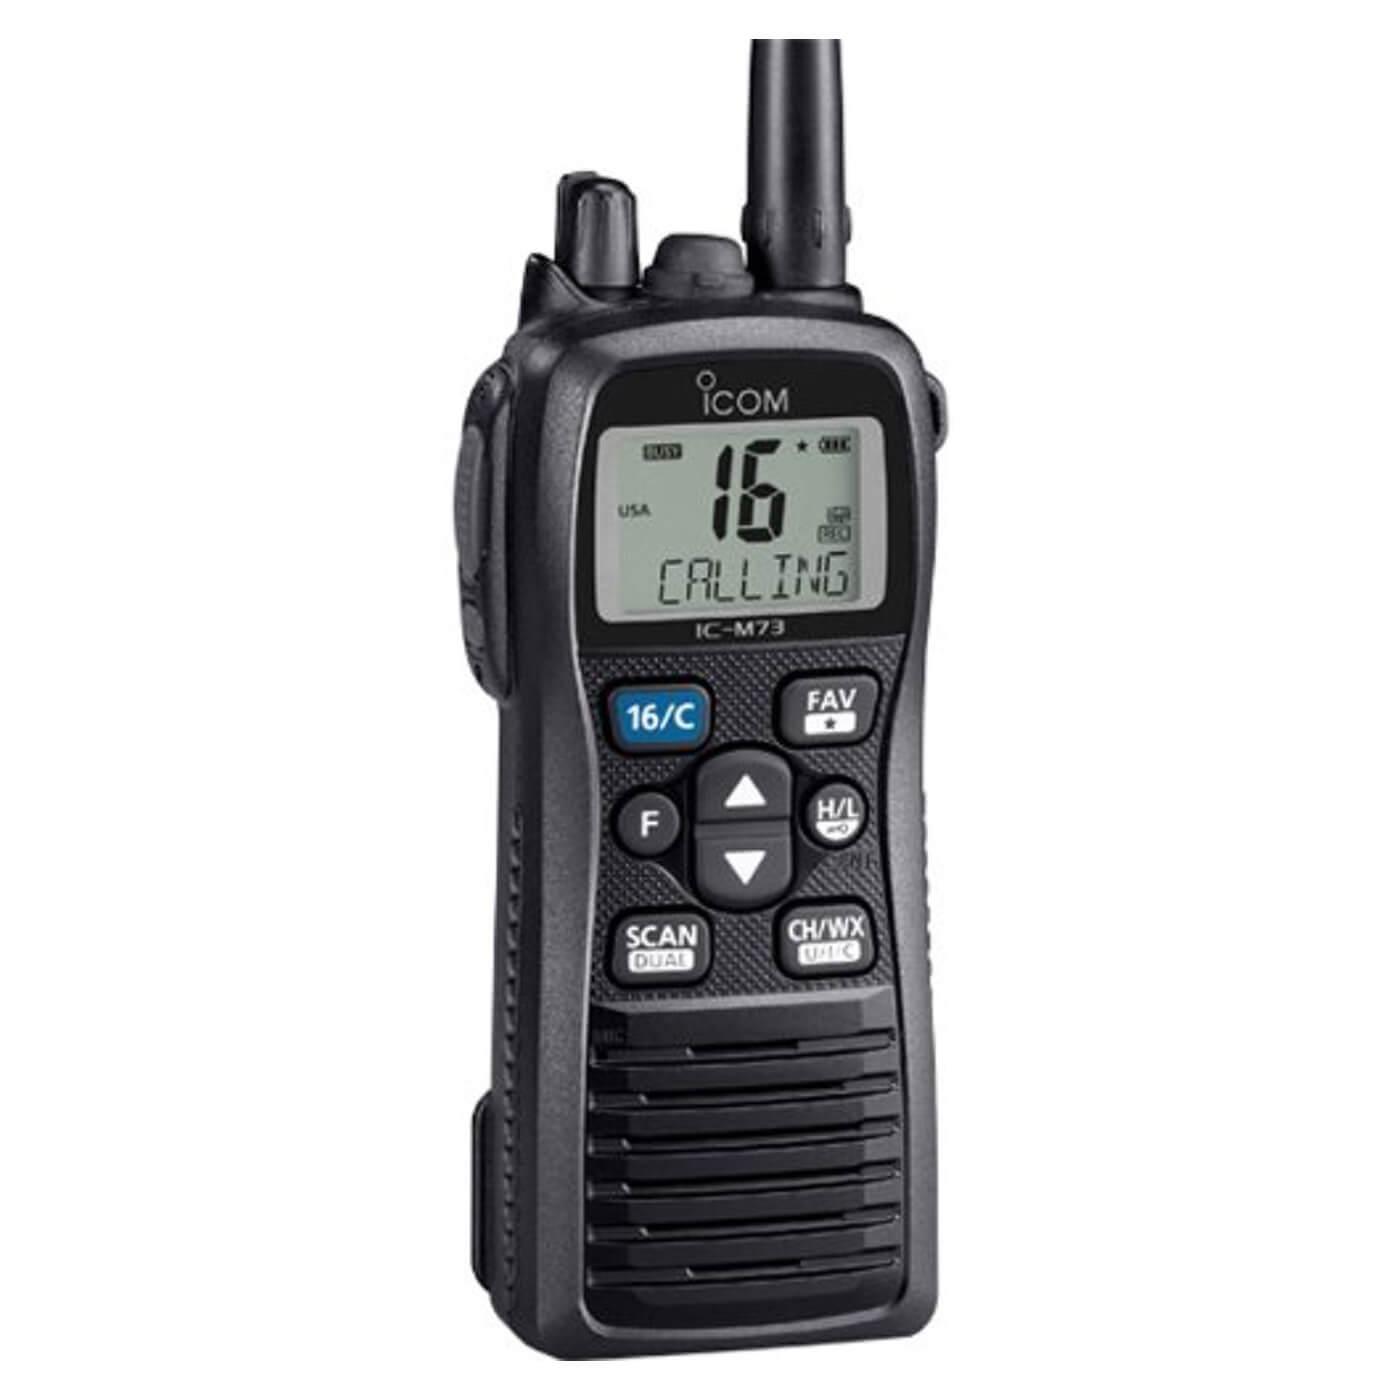 Icom IC-M73 radio